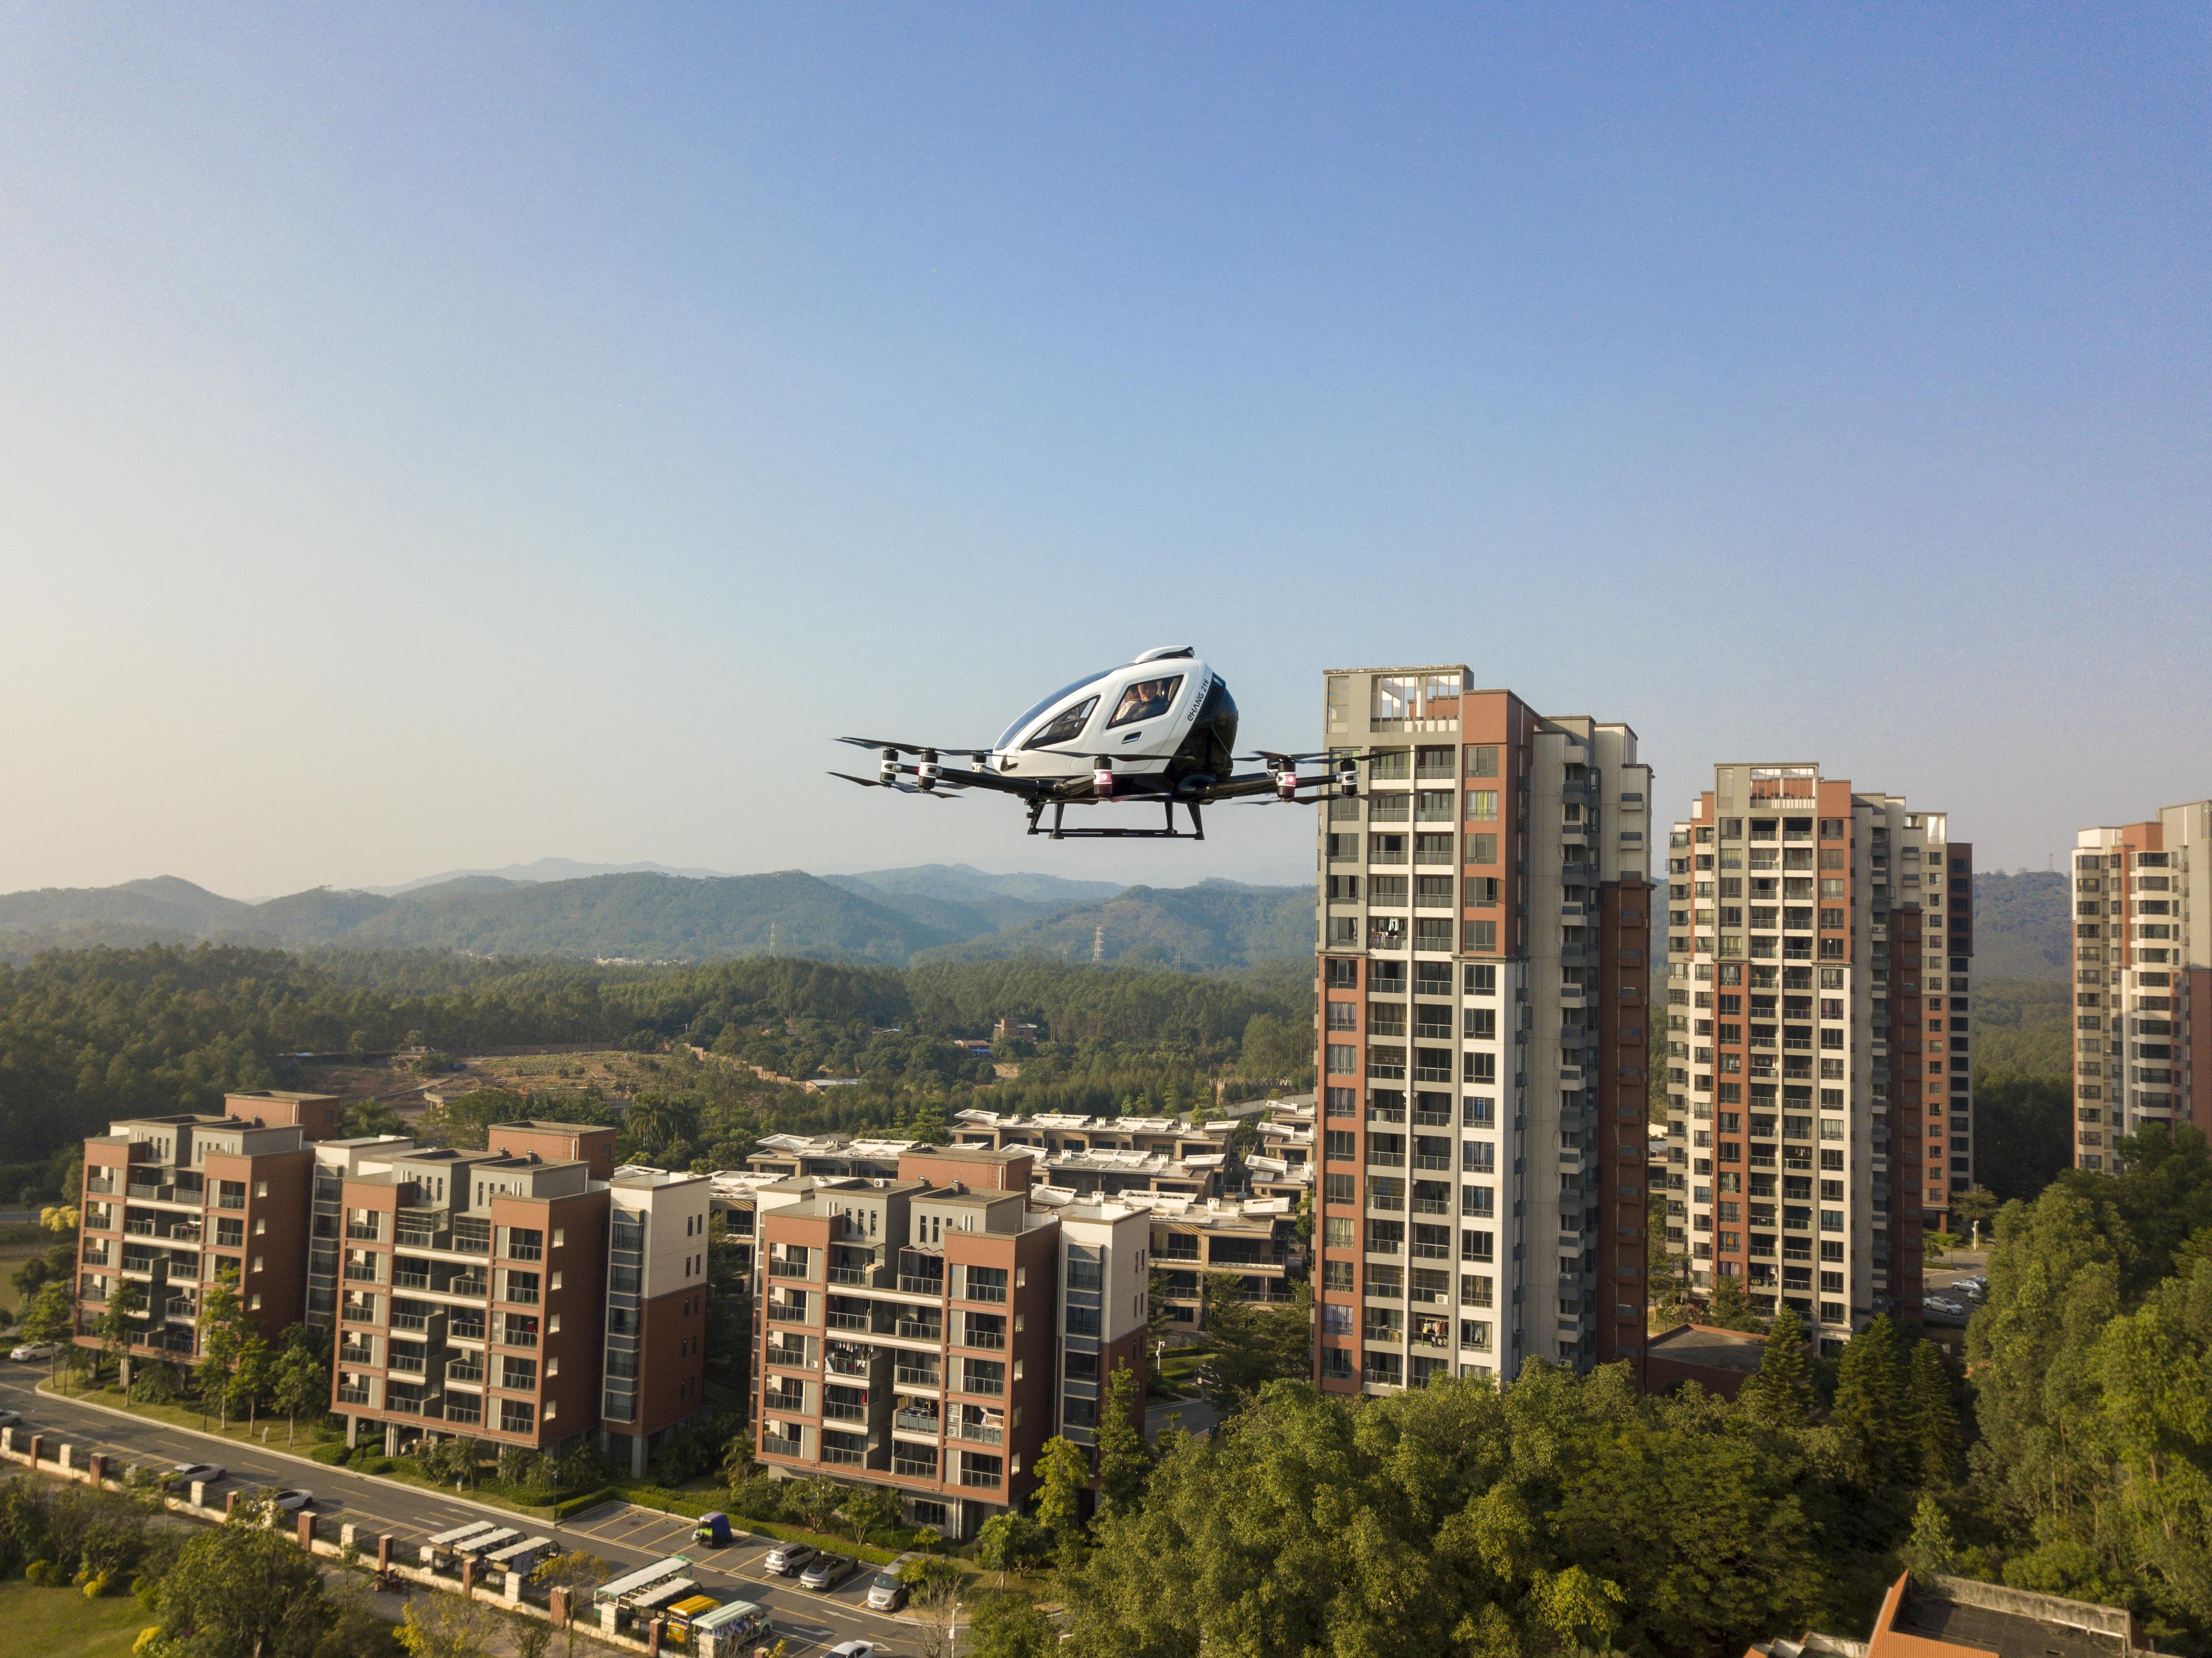 aerial tourist fying eVTOL